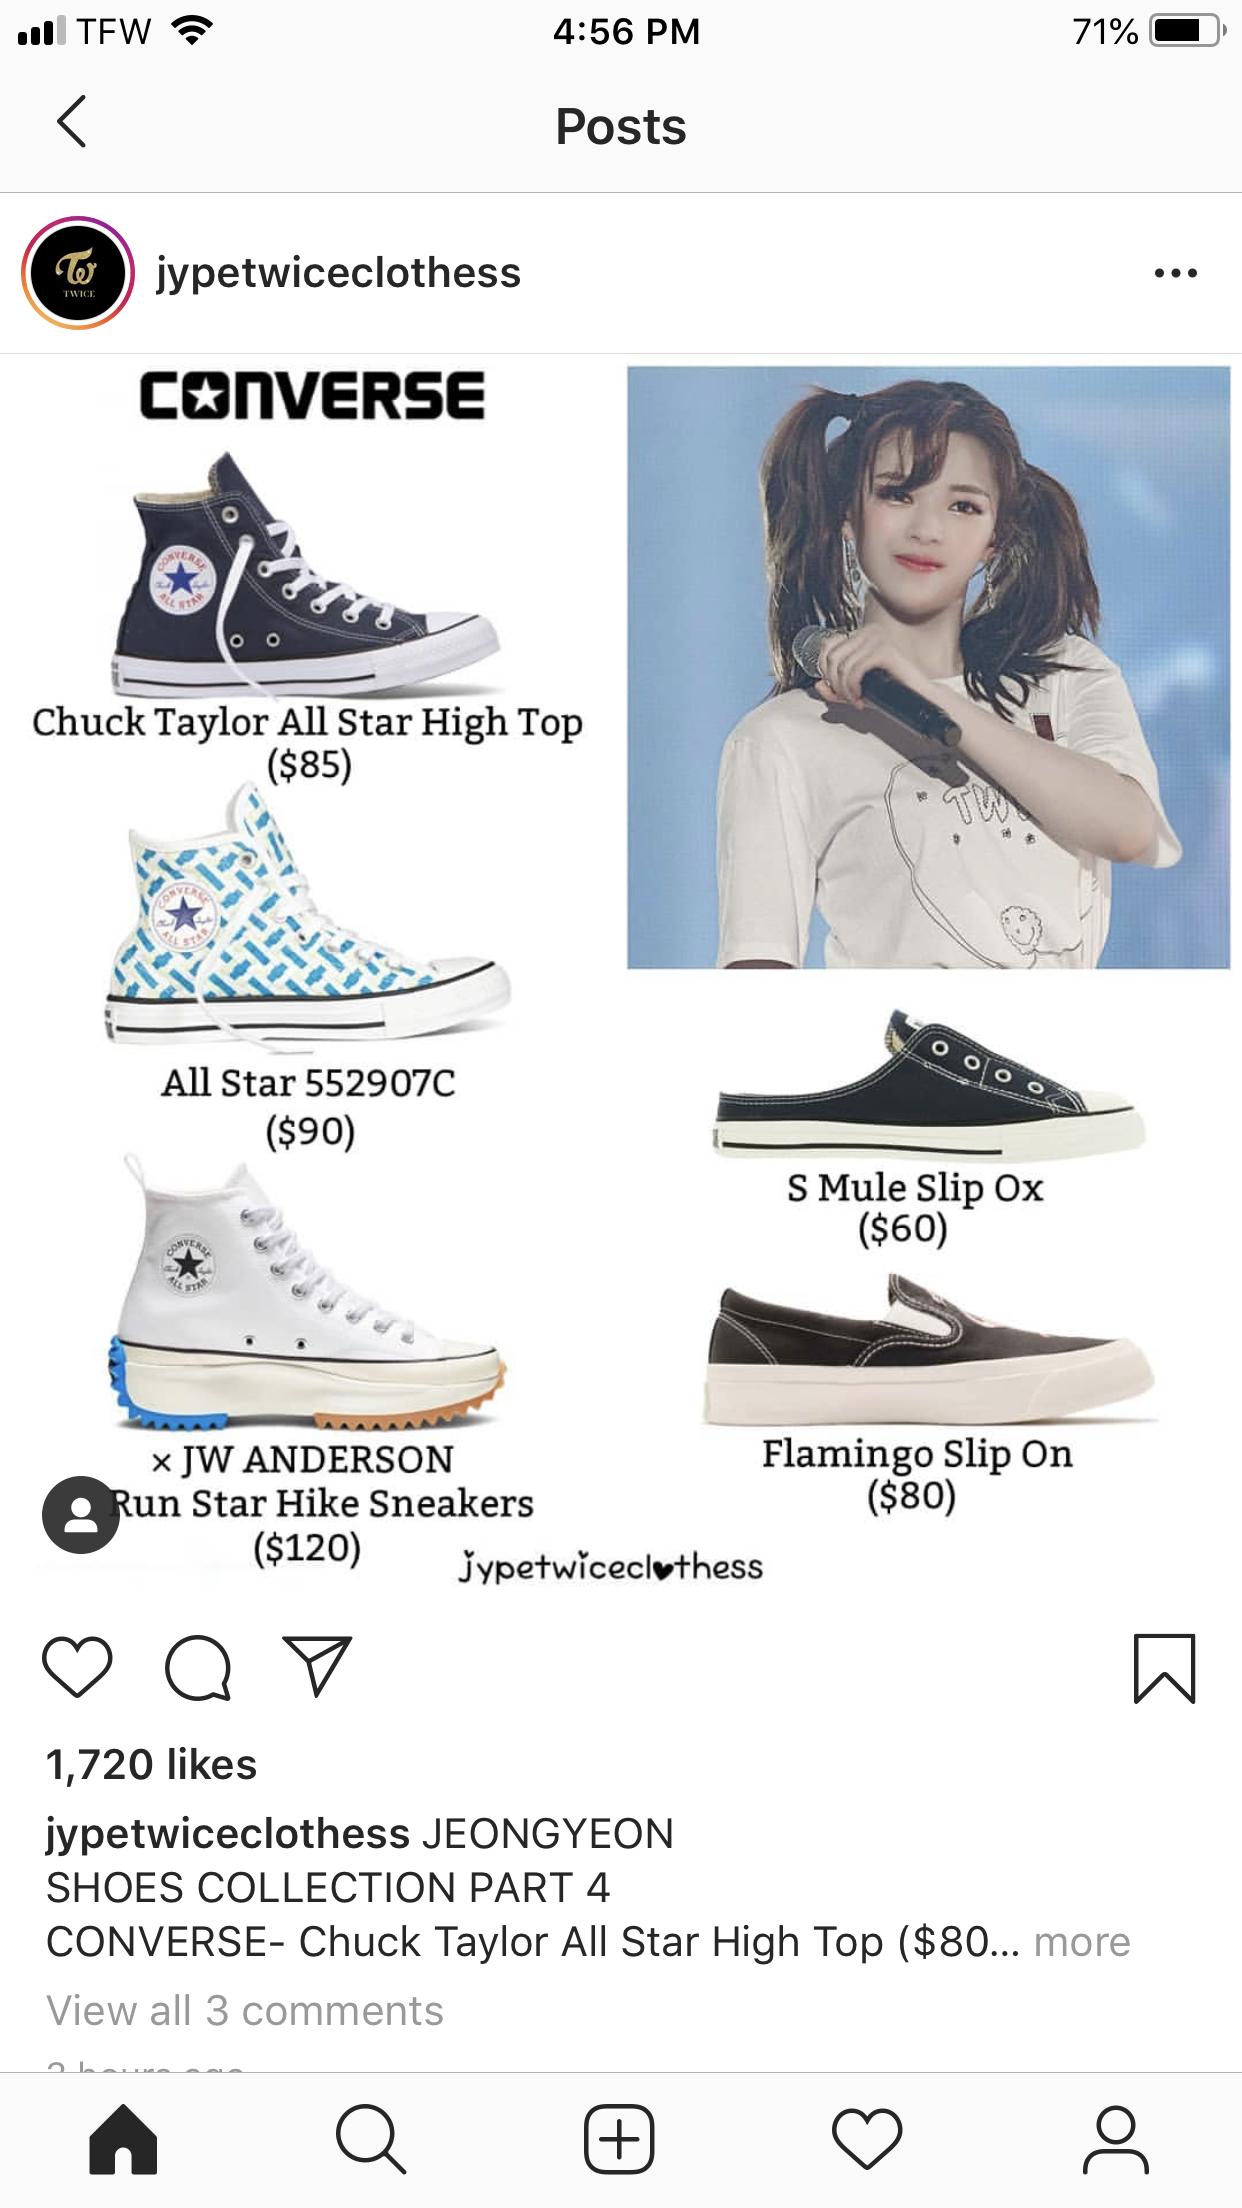 Pin By Sheisnotofficial On Korean Fashion Converse Chuck Taylor All Star Korean Fashion Chuck Taylor All Star